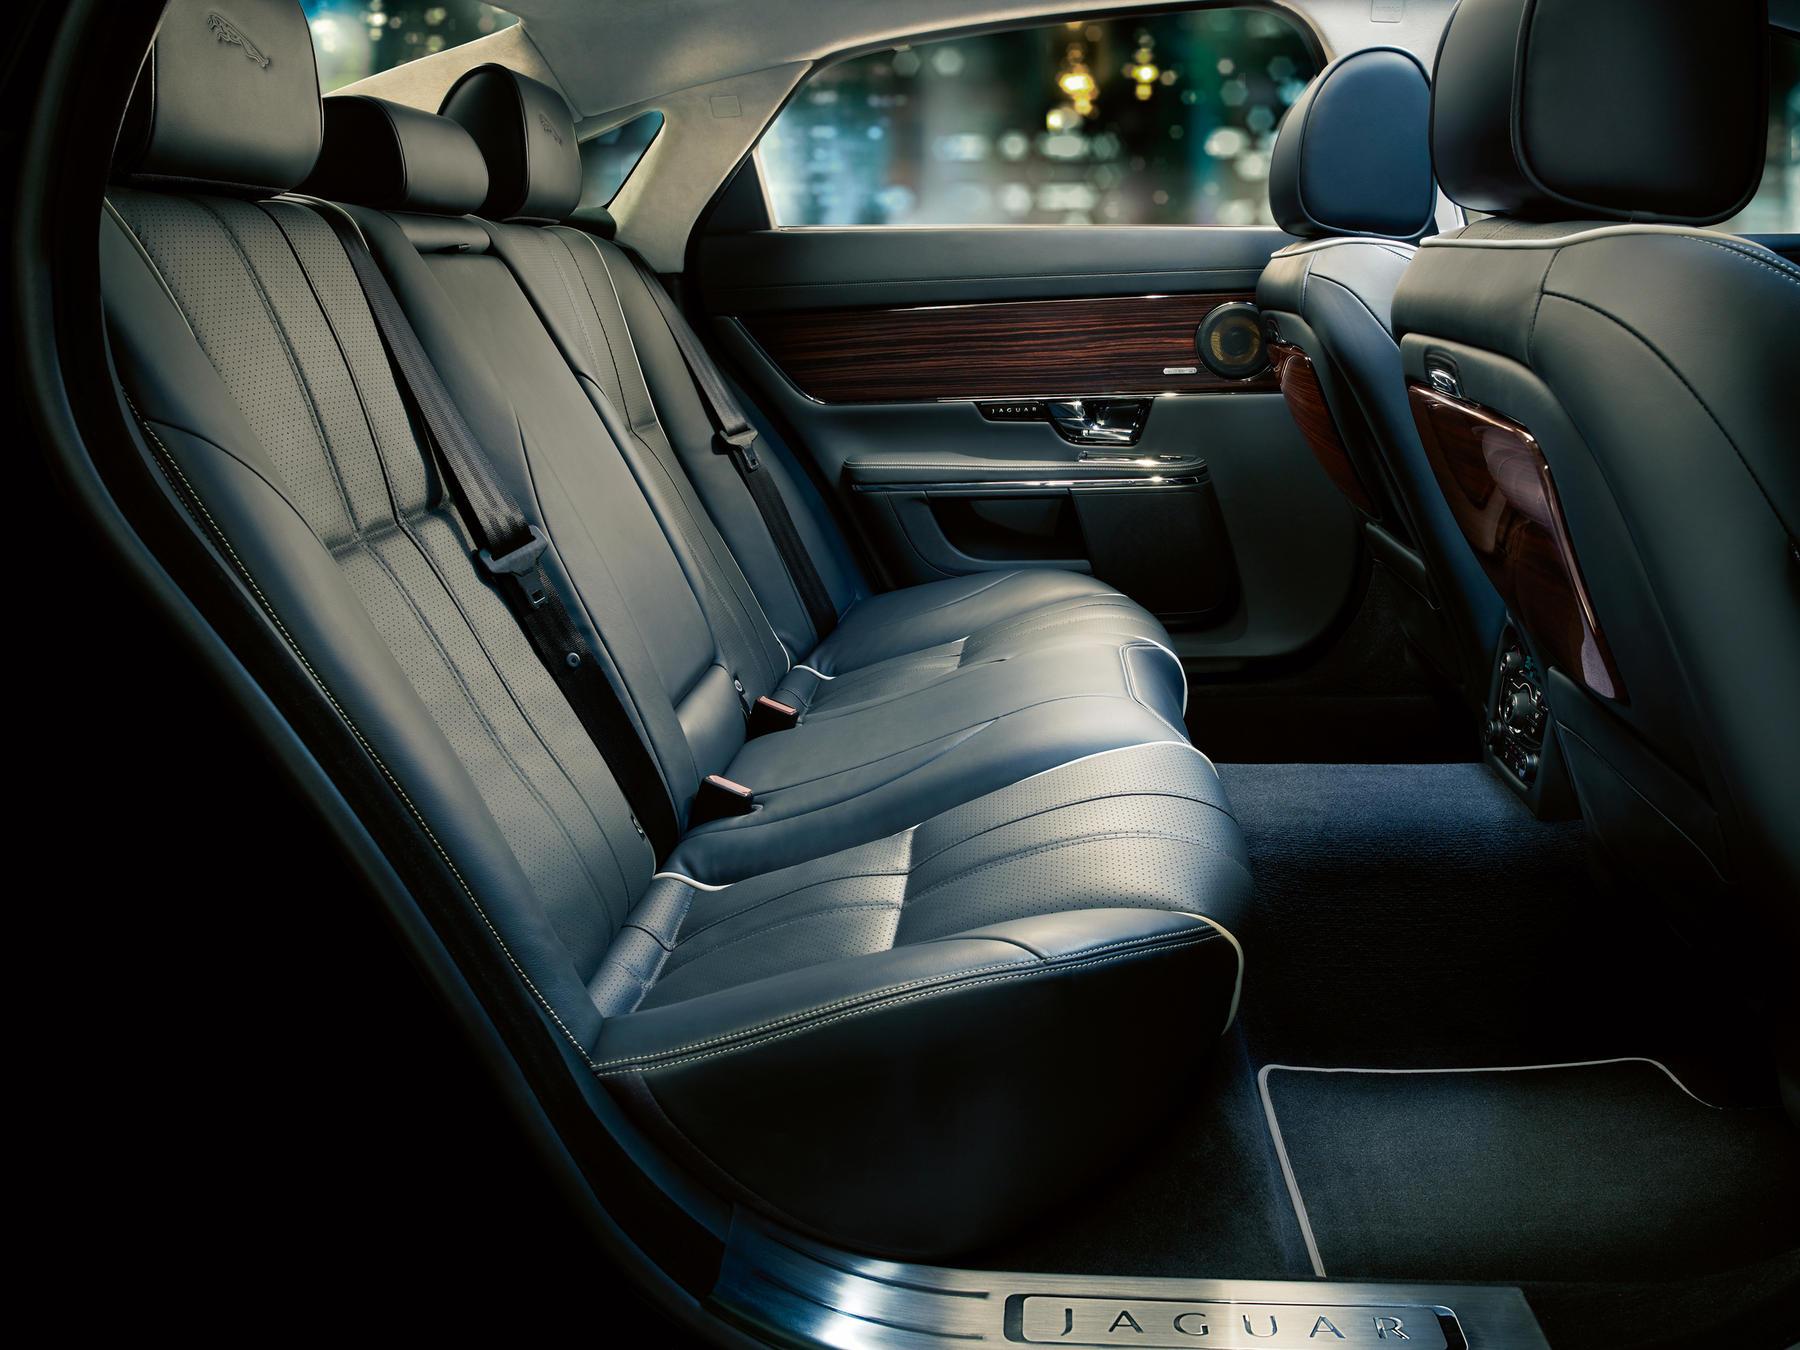 2011 Jaguar XJSeries Reviews and Rating  Motor Trend